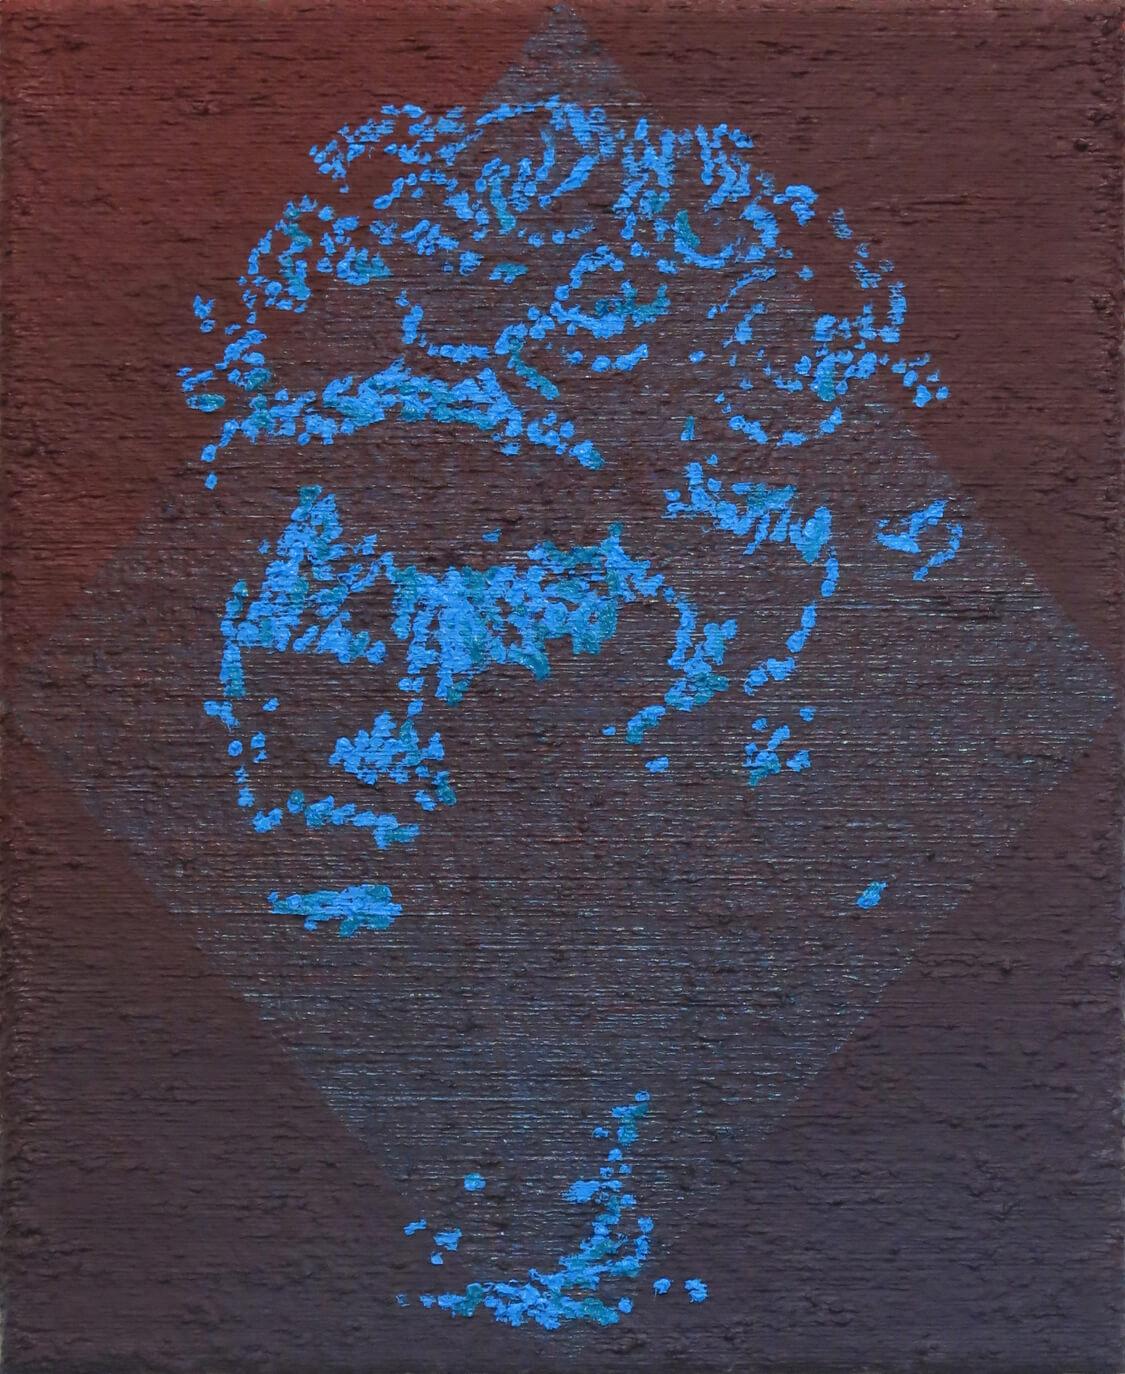 Head I - Oil on Canvas, 55 x 45 cm, 2016